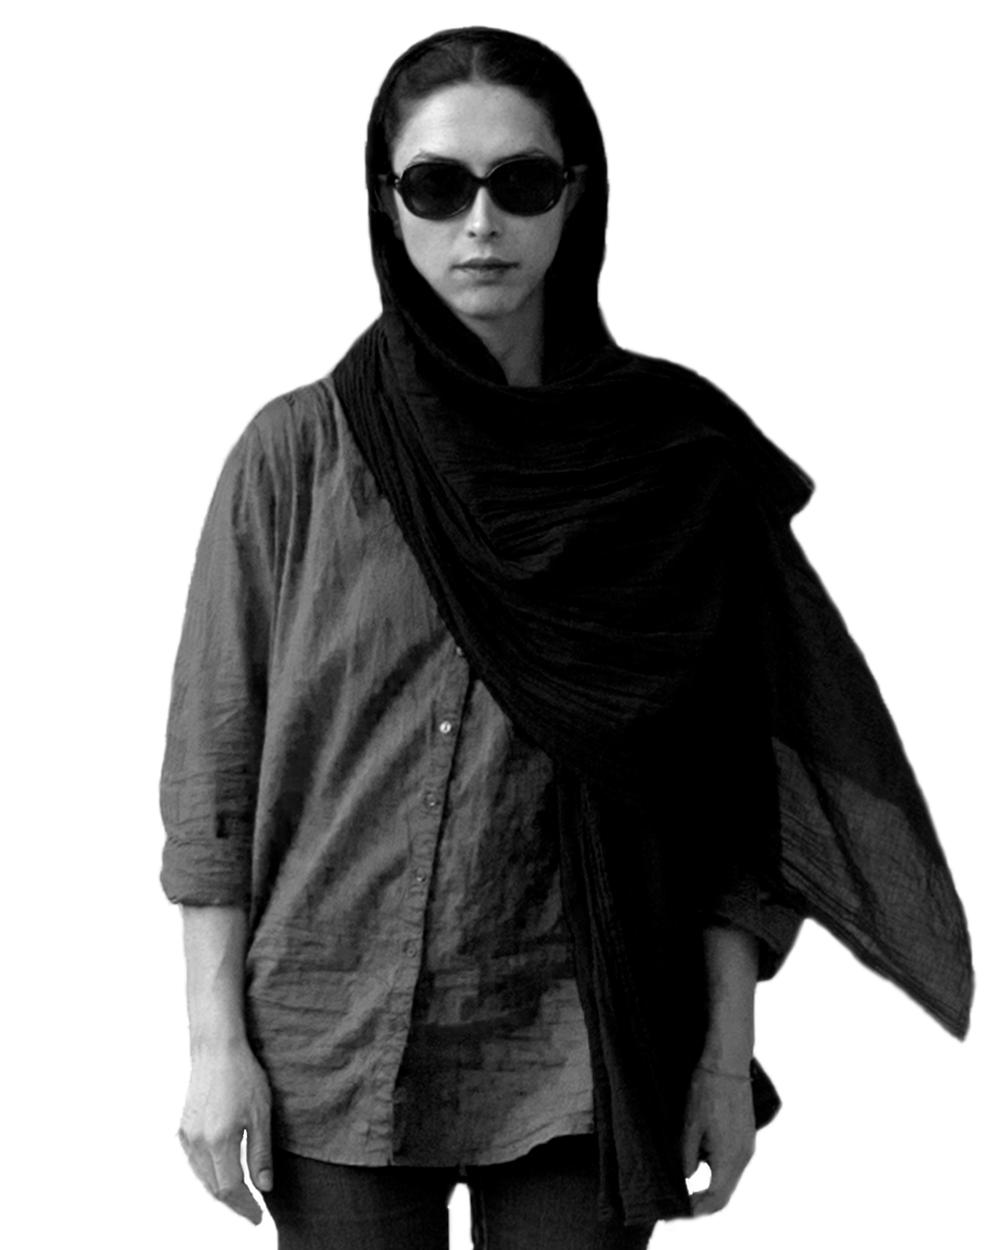 Topos 2015 Autoportrait Teheran